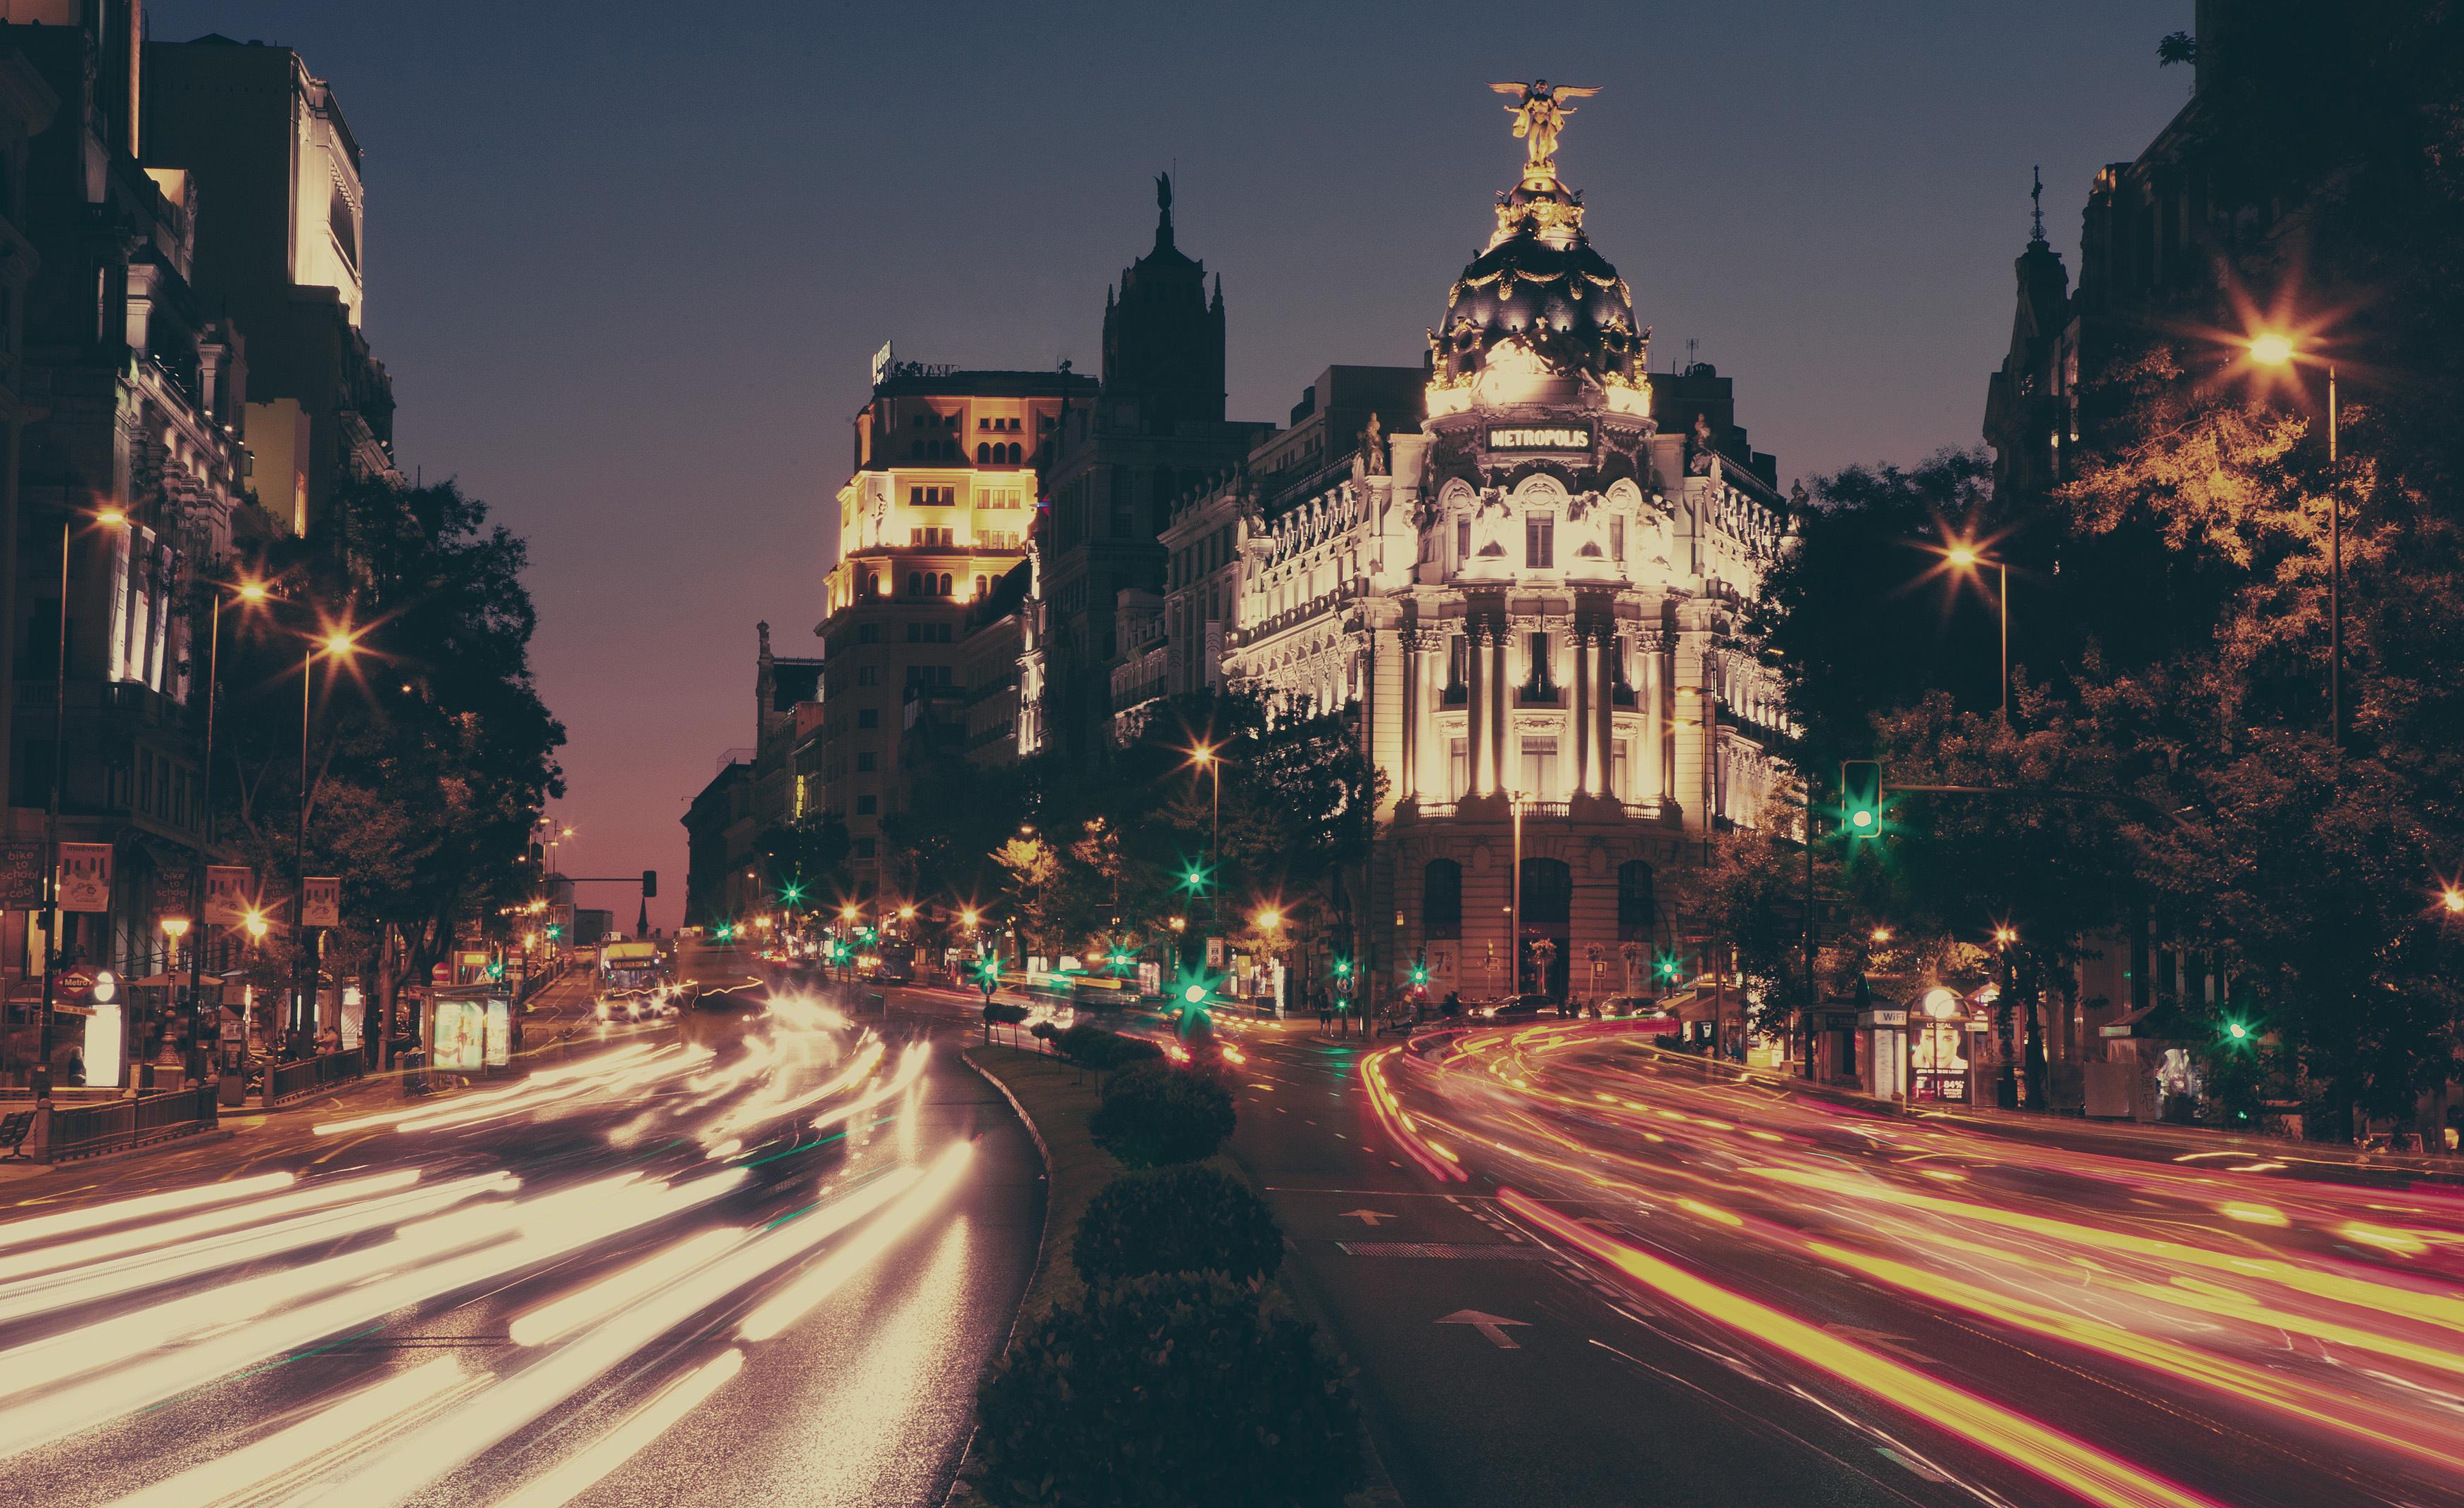 The Metropolis building at night, Madrid.